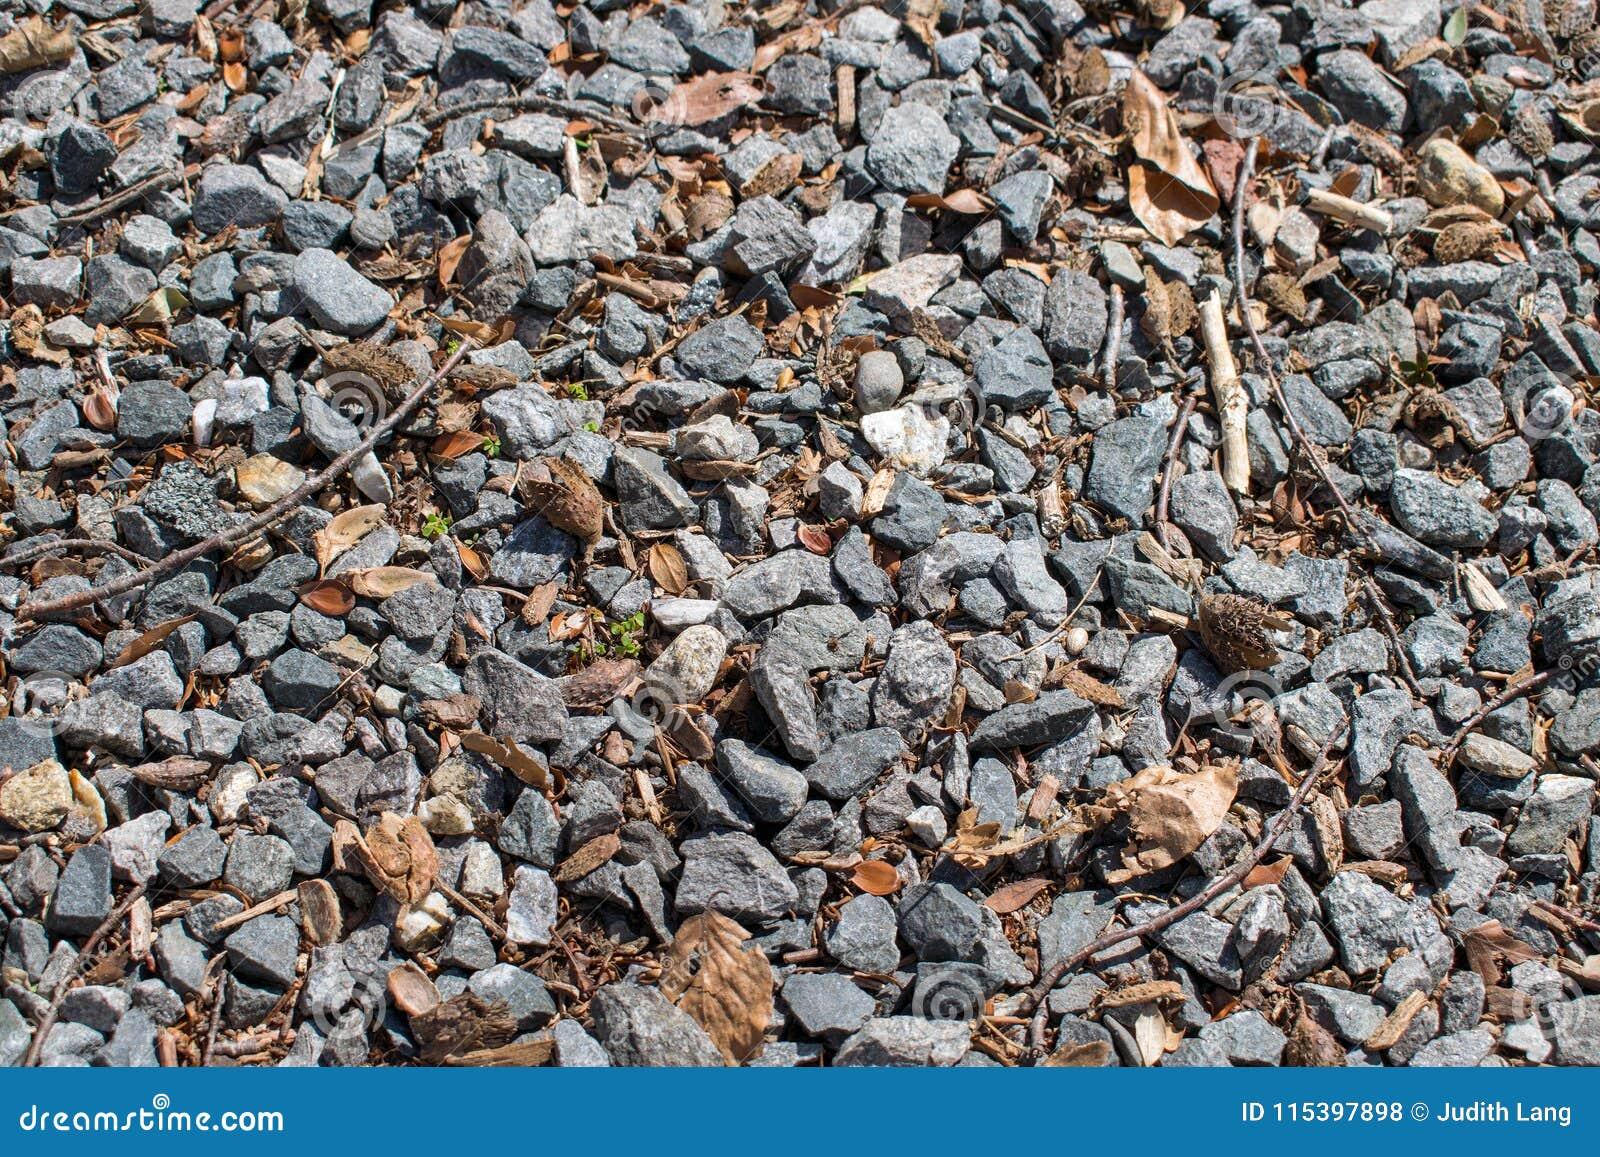 Driveway αμμοχάλικο που αναμιγνύεται με τα φύλλα και τους κλαδίσκους